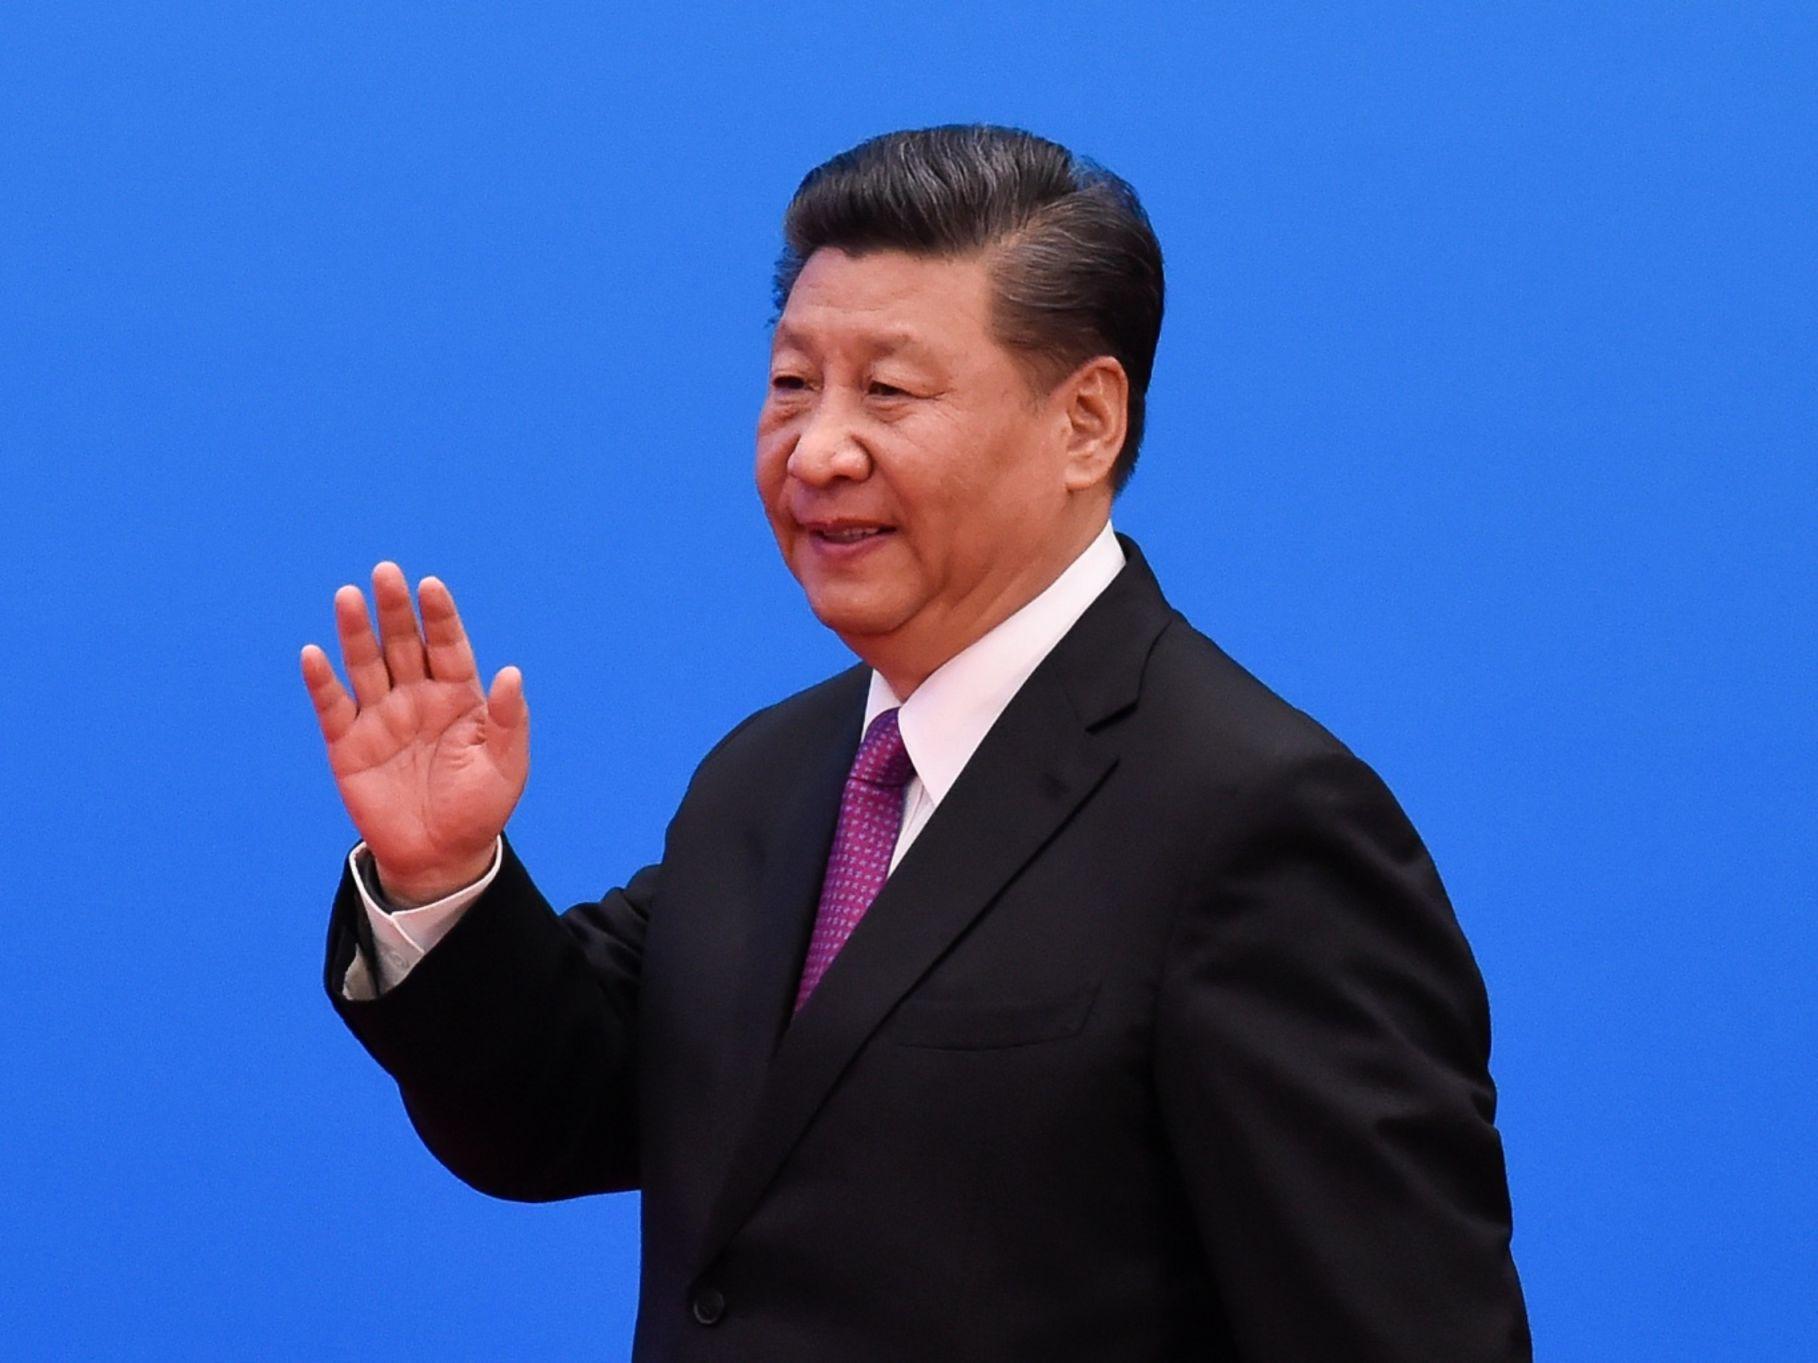 Business Maverick: Xi Challenges U.S. Global Leadership, Warns Against Decoupling